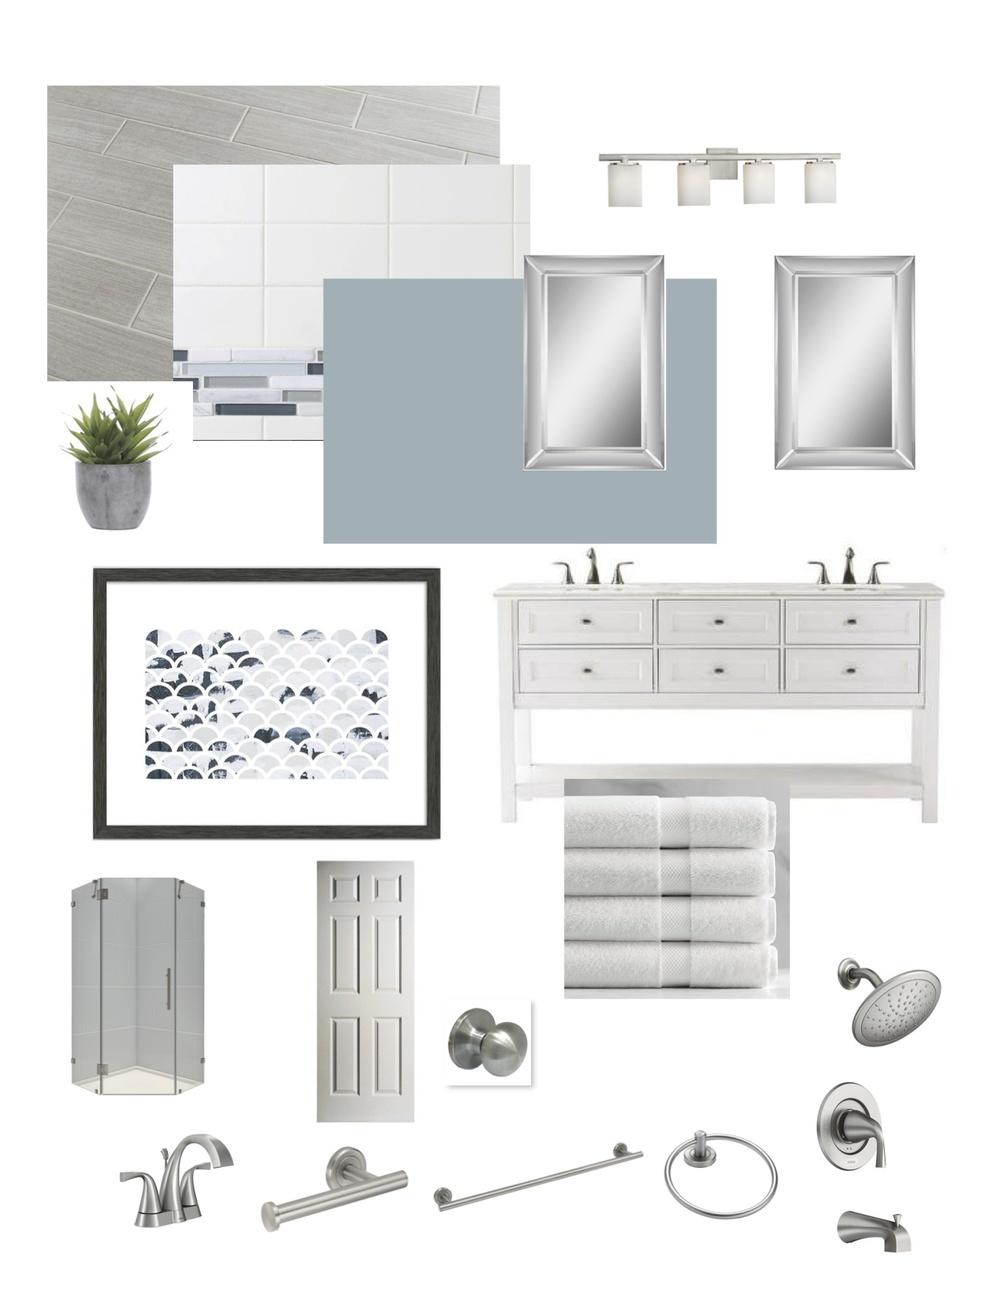 Bathroom Remodel For Under 6 000 Dwelling Studio